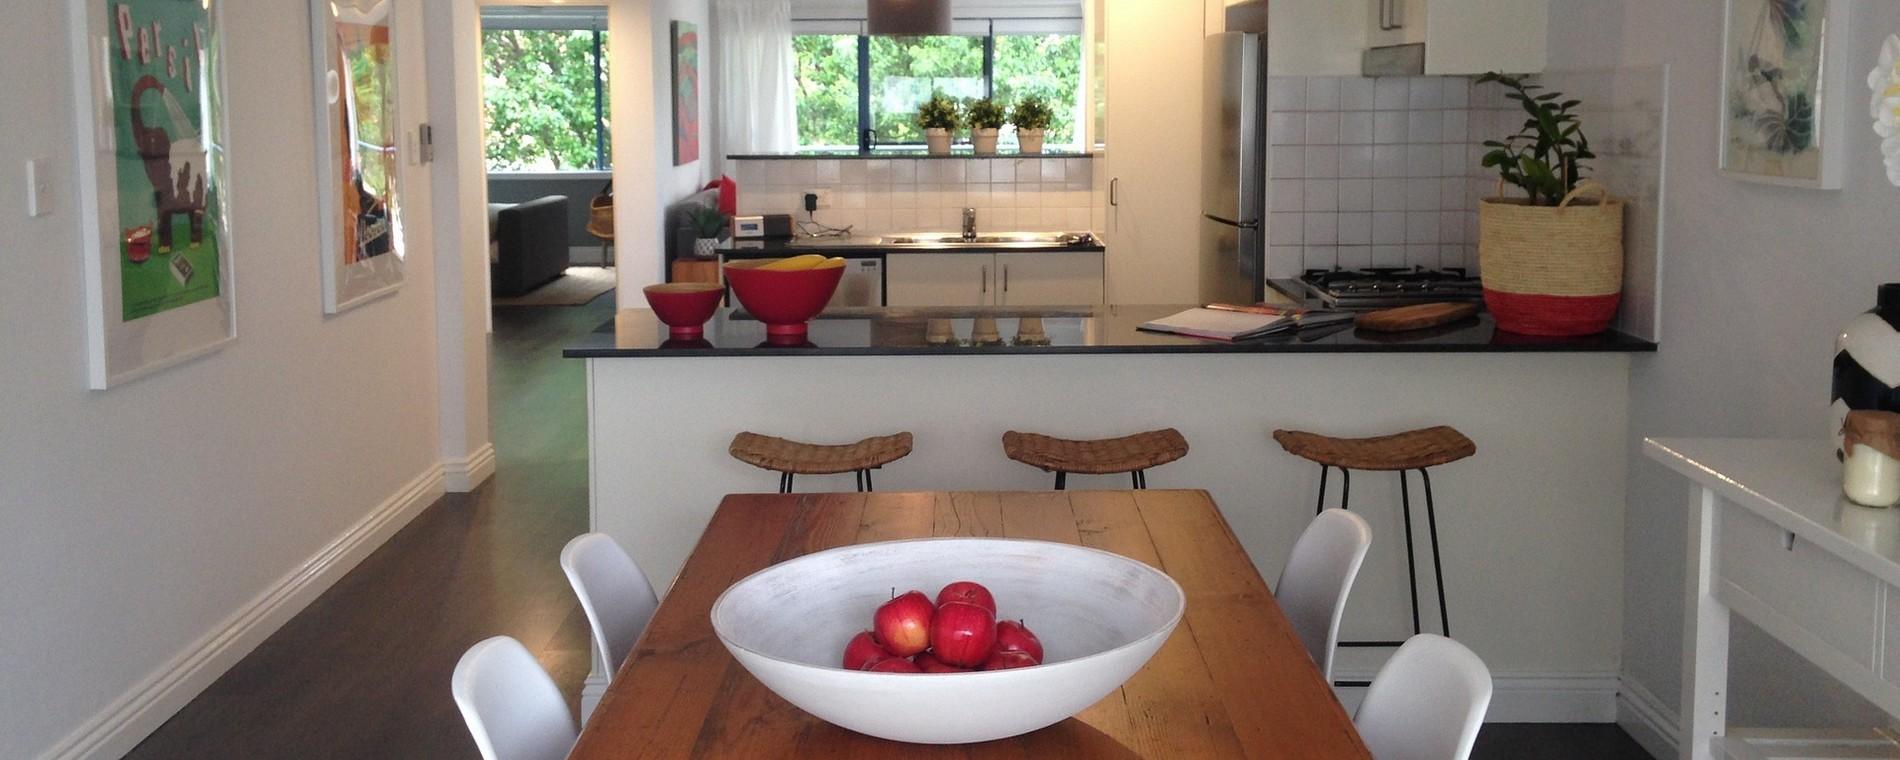 astuce deco maison a vendre com u caen u sol incroyable deco salon maison a vendre linge de. Black Bedroom Furniture Sets. Home Design Ideas